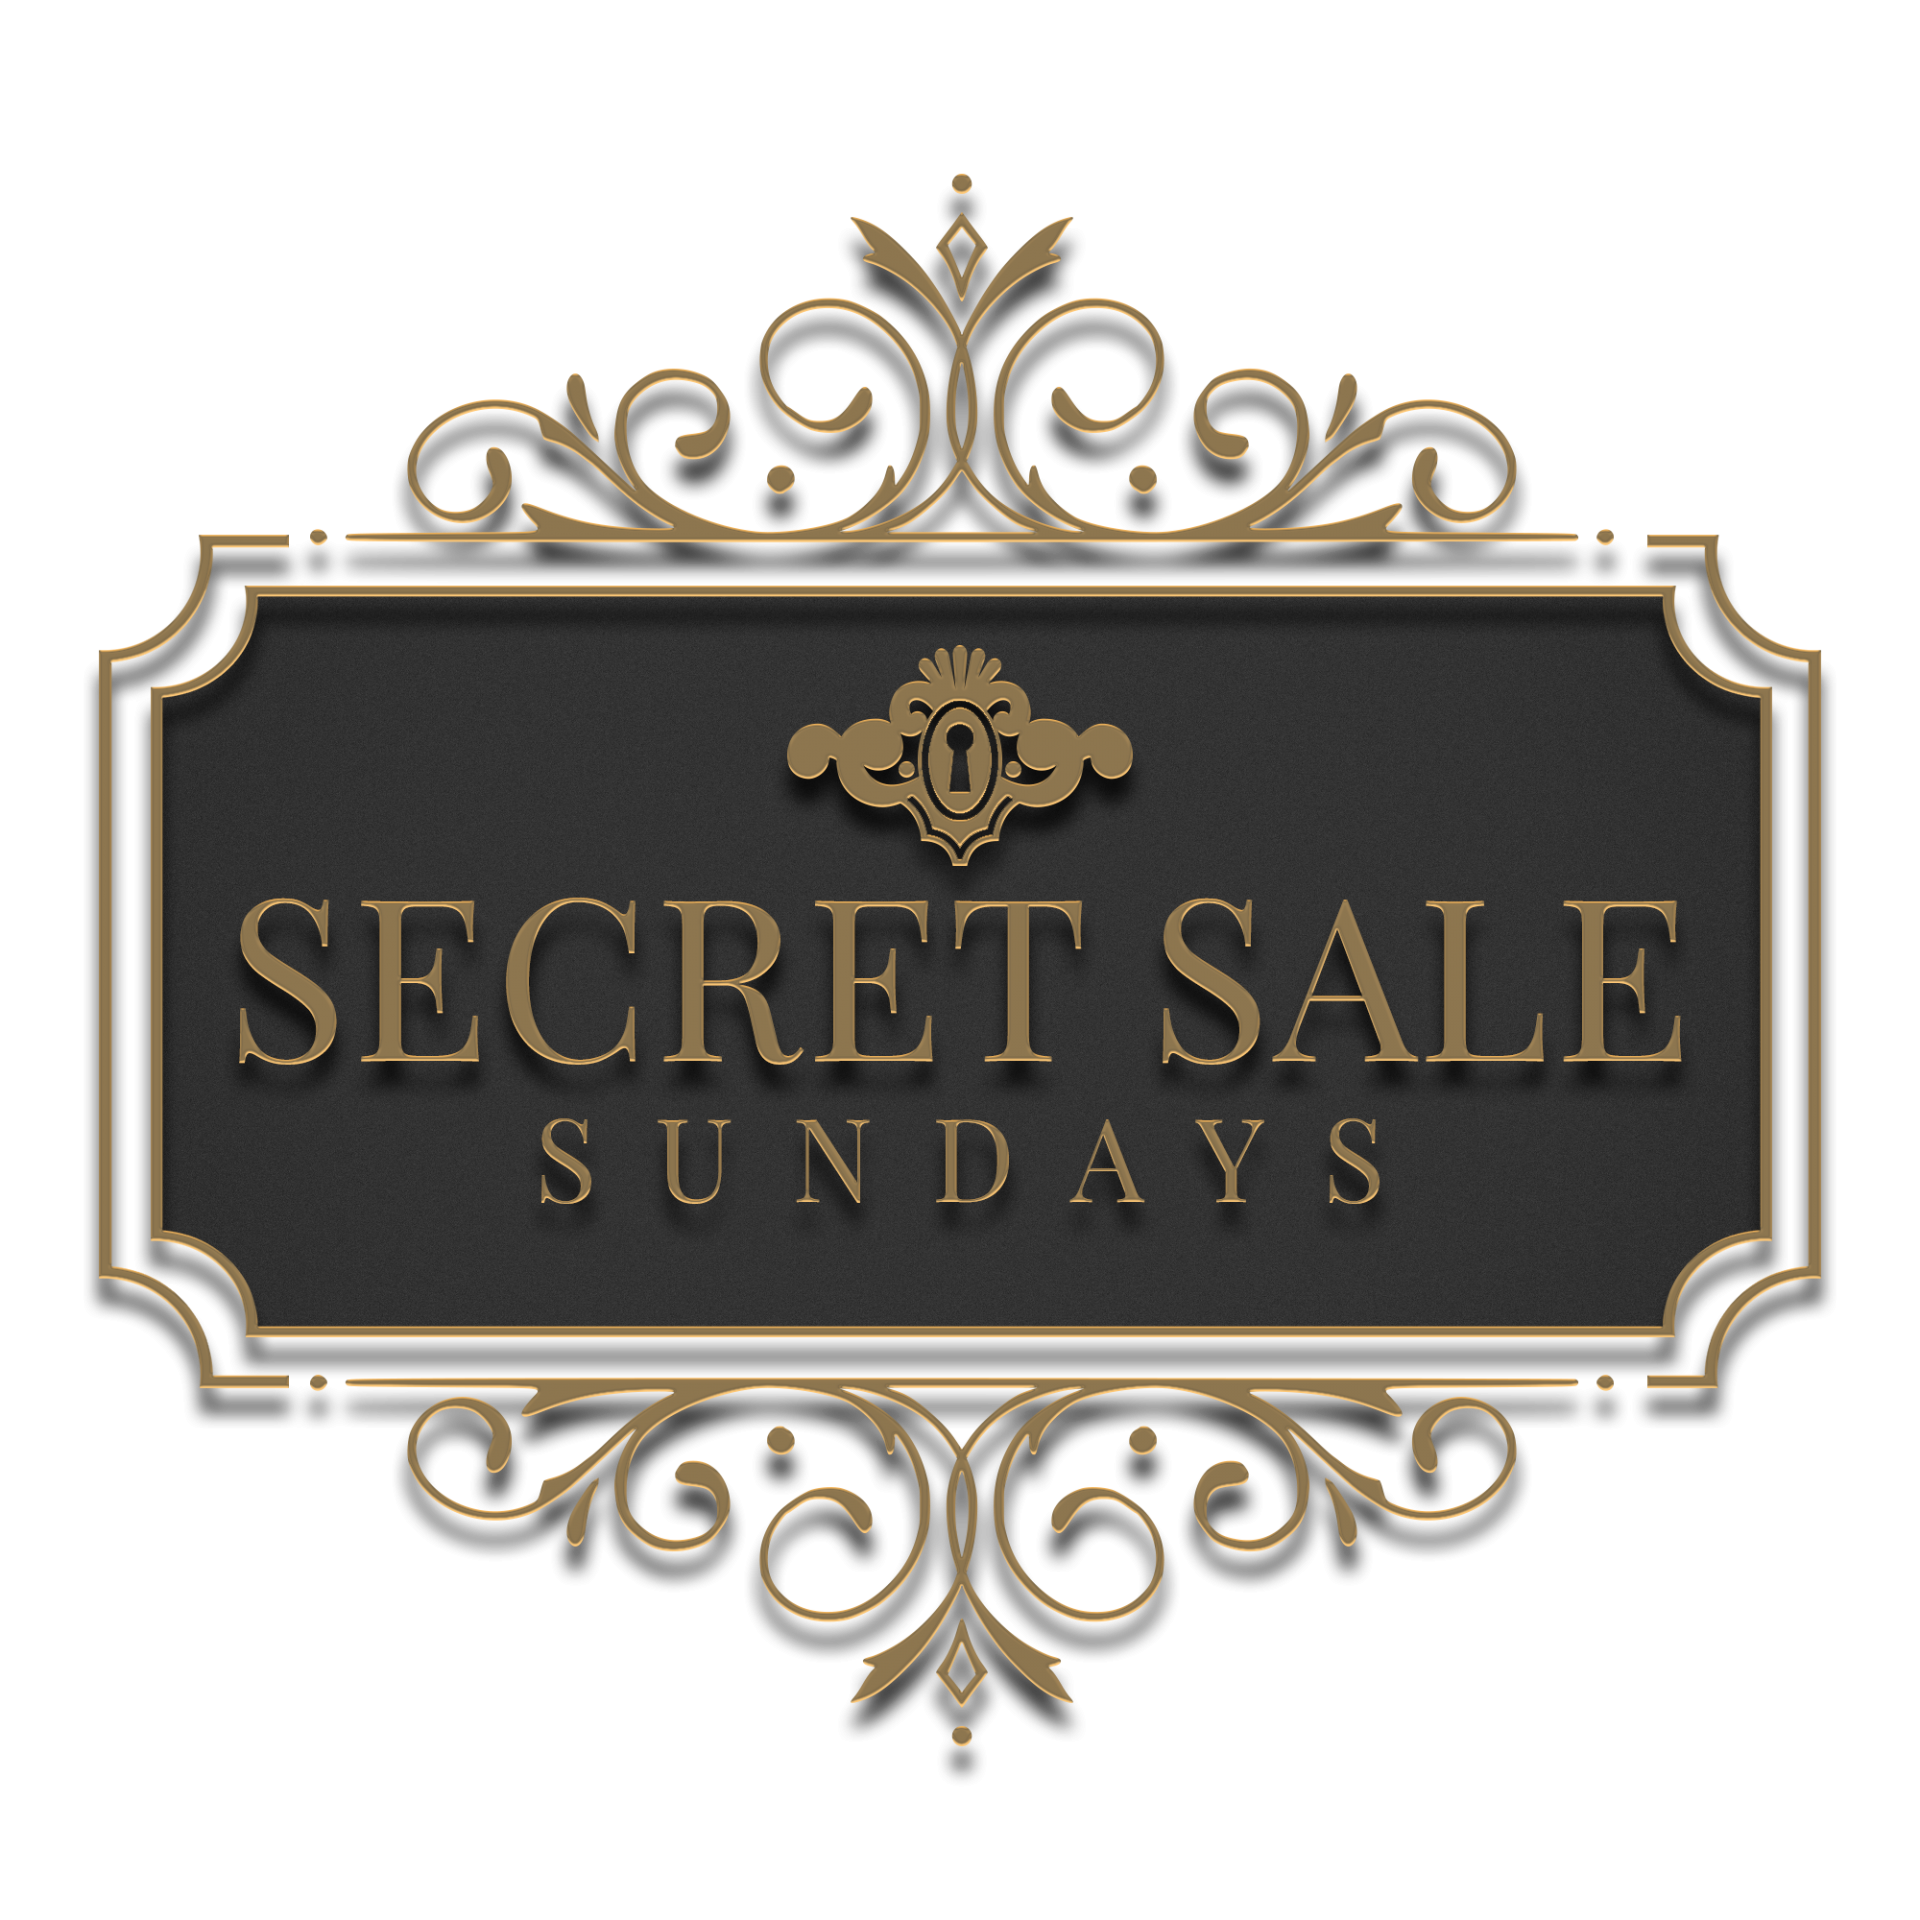 Secret Sale Sundays September 27th 2020